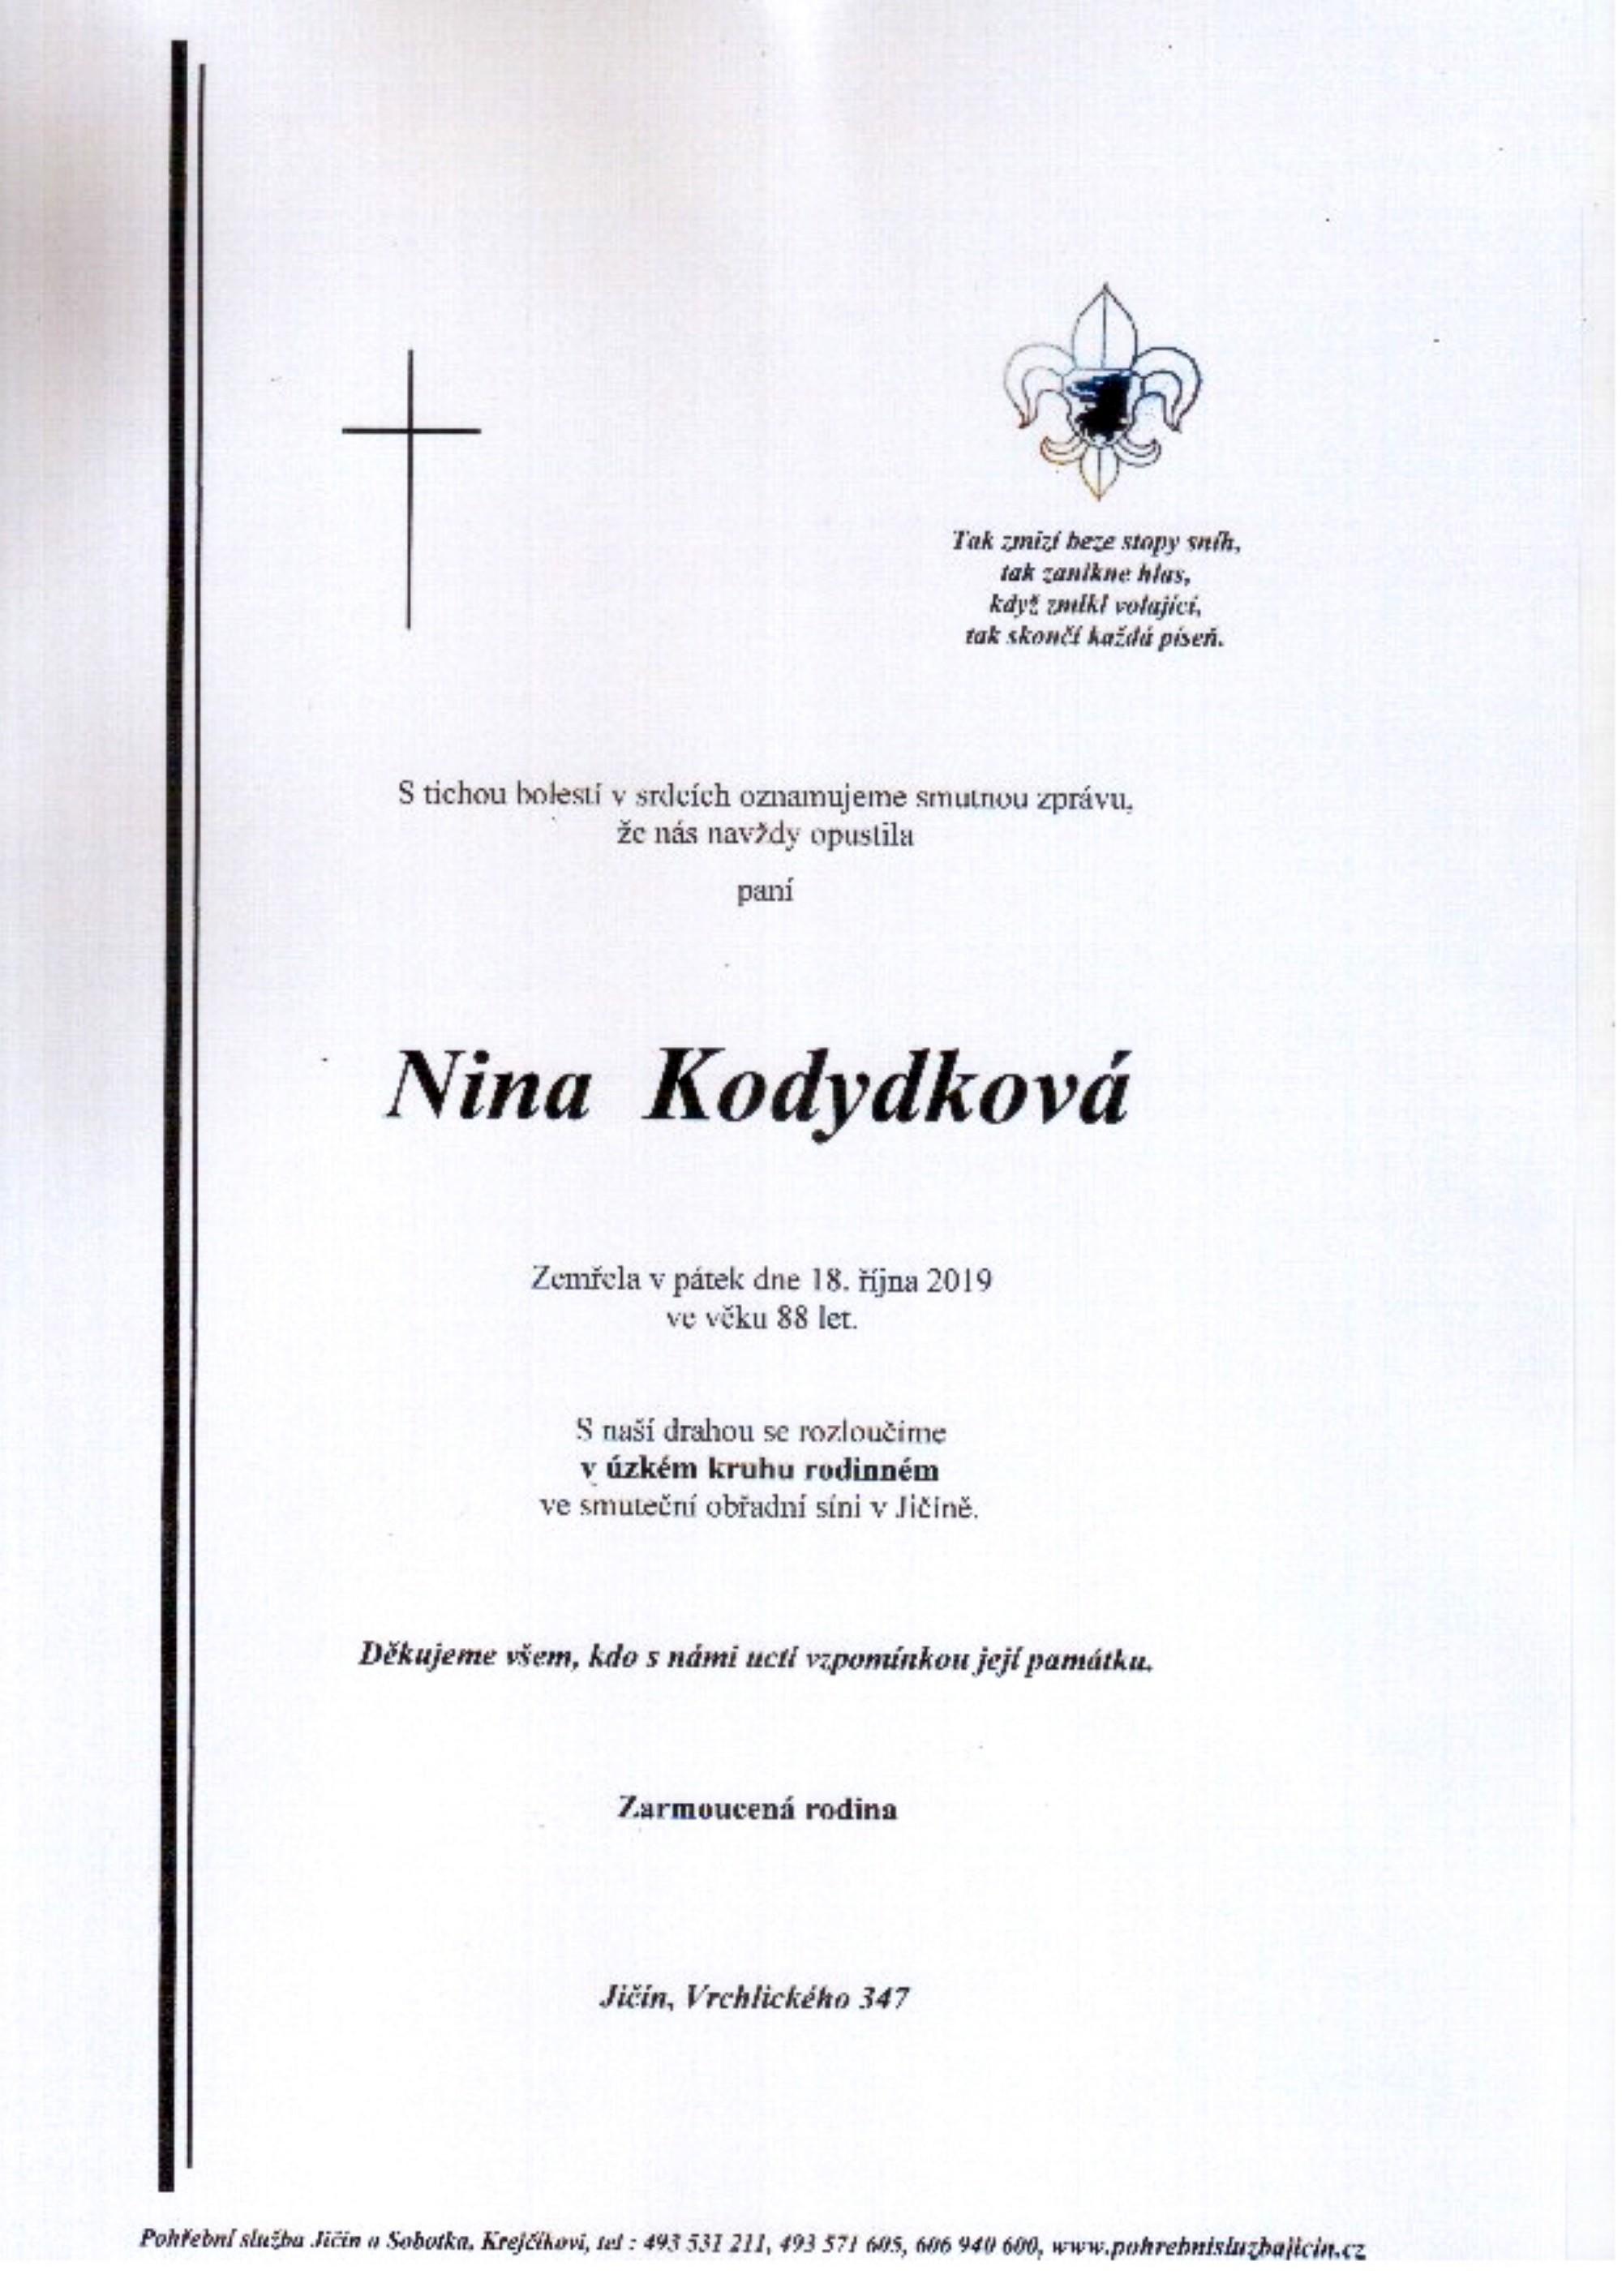 Nina Kodydková